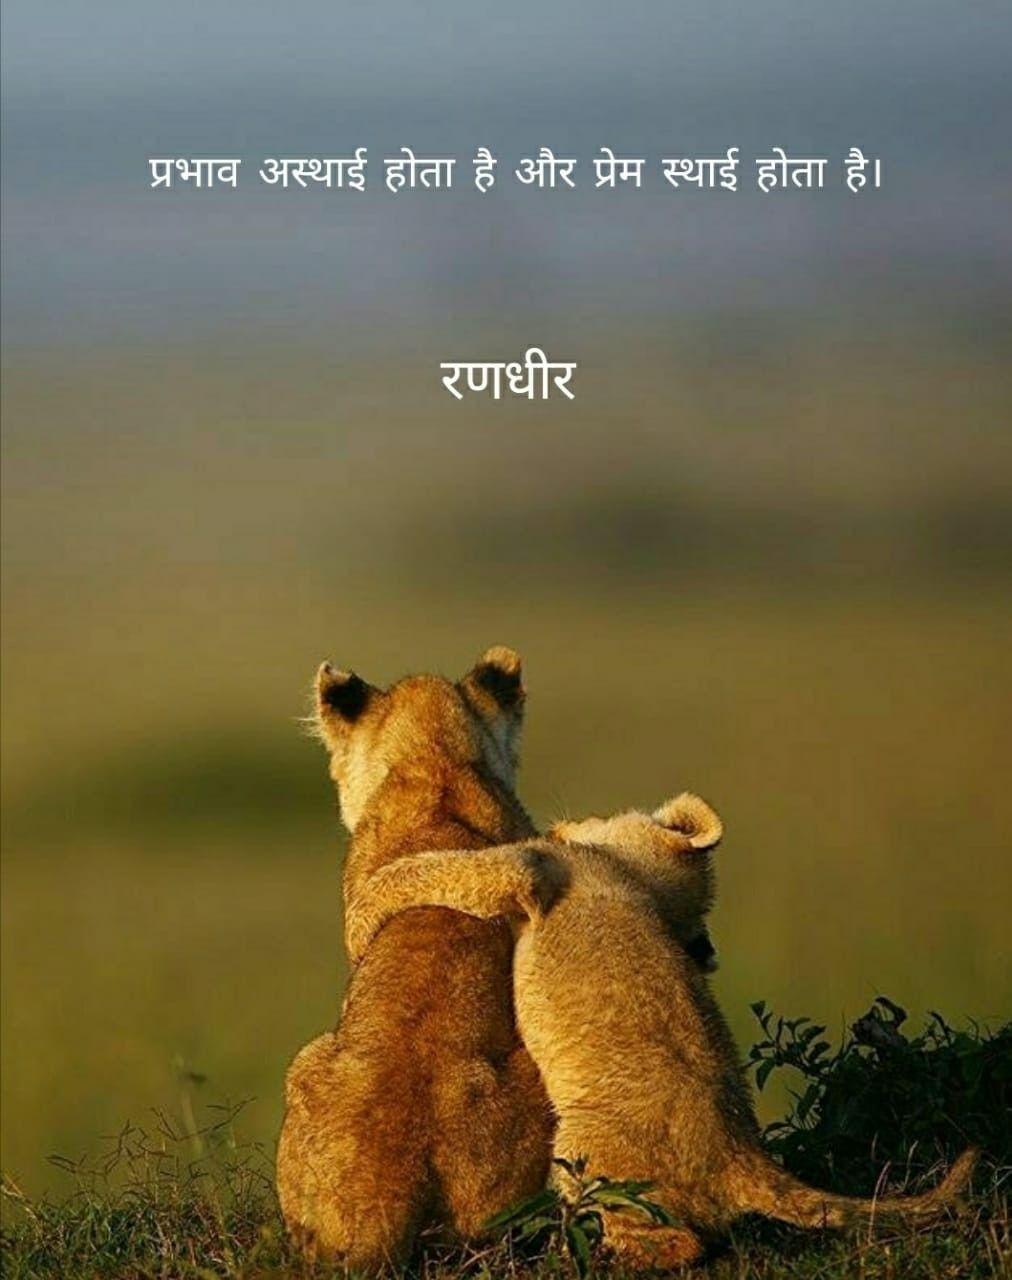 Animal Quotes In Hindi • Opzetzwembadshop nl